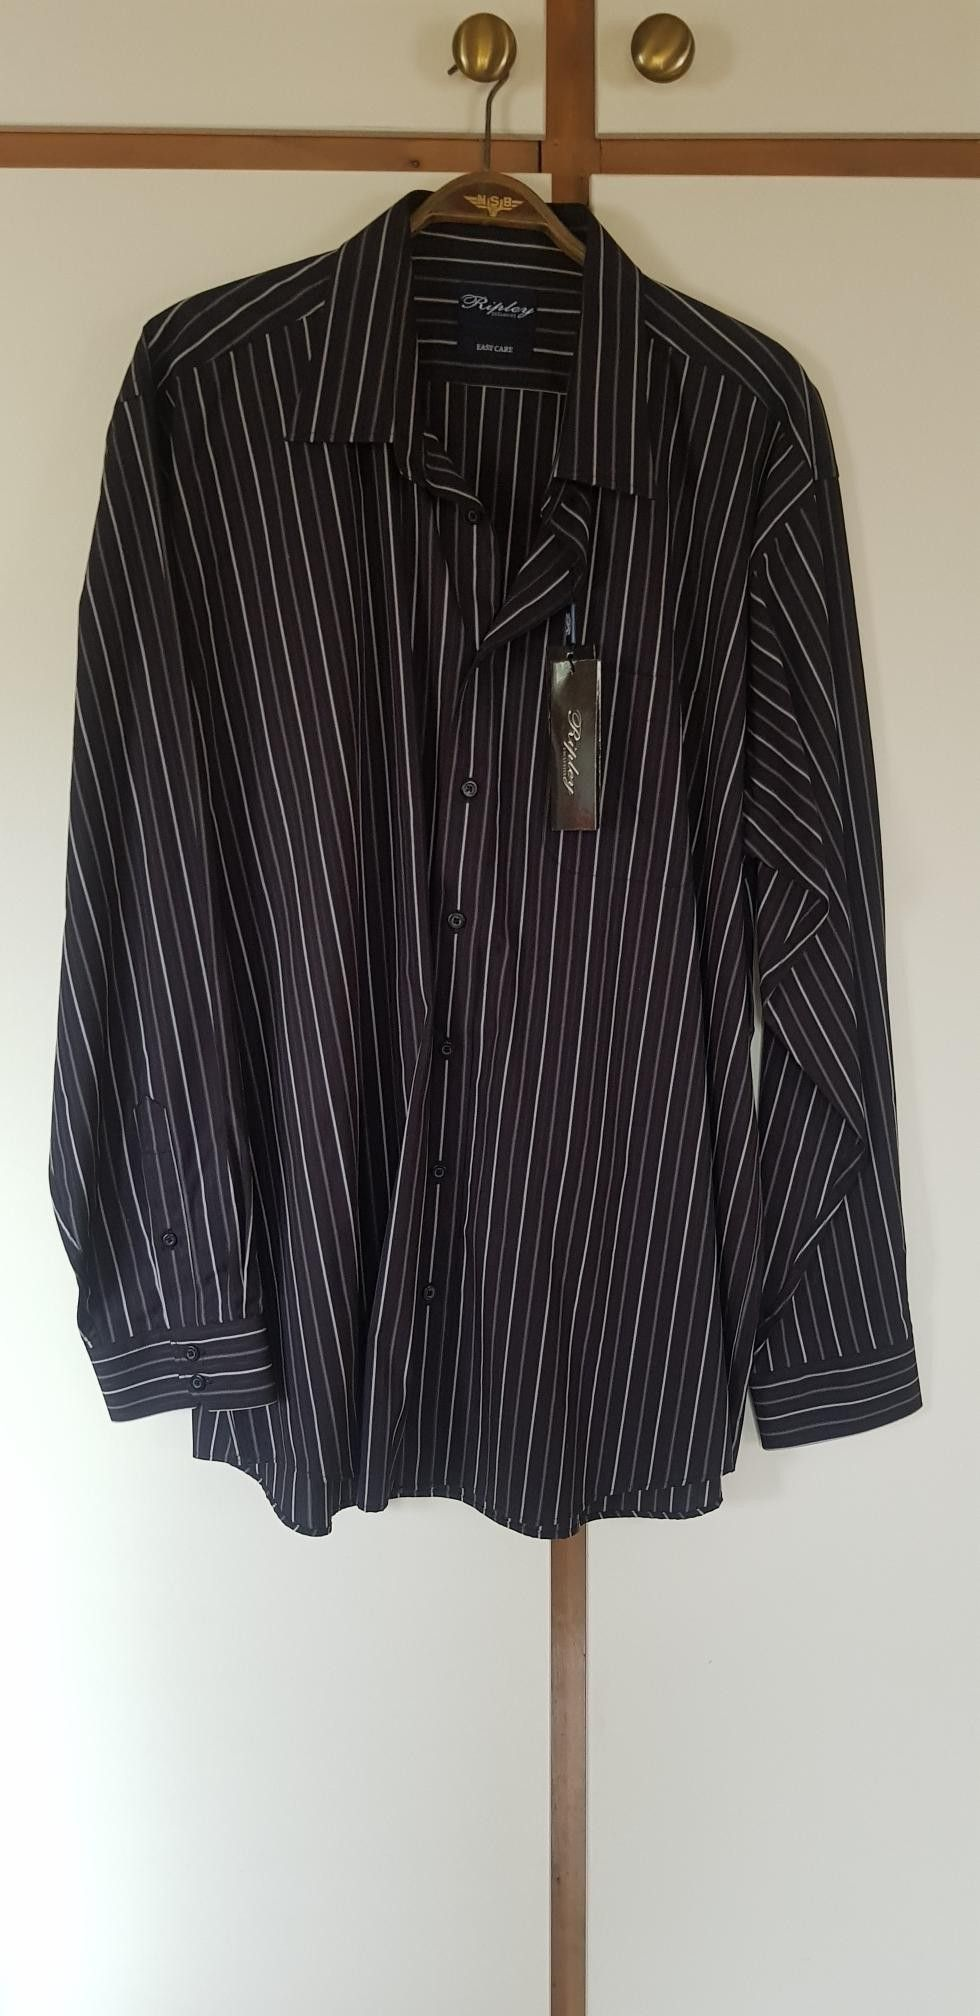 Som ny penskjorte fra Bertoni | FINN.no